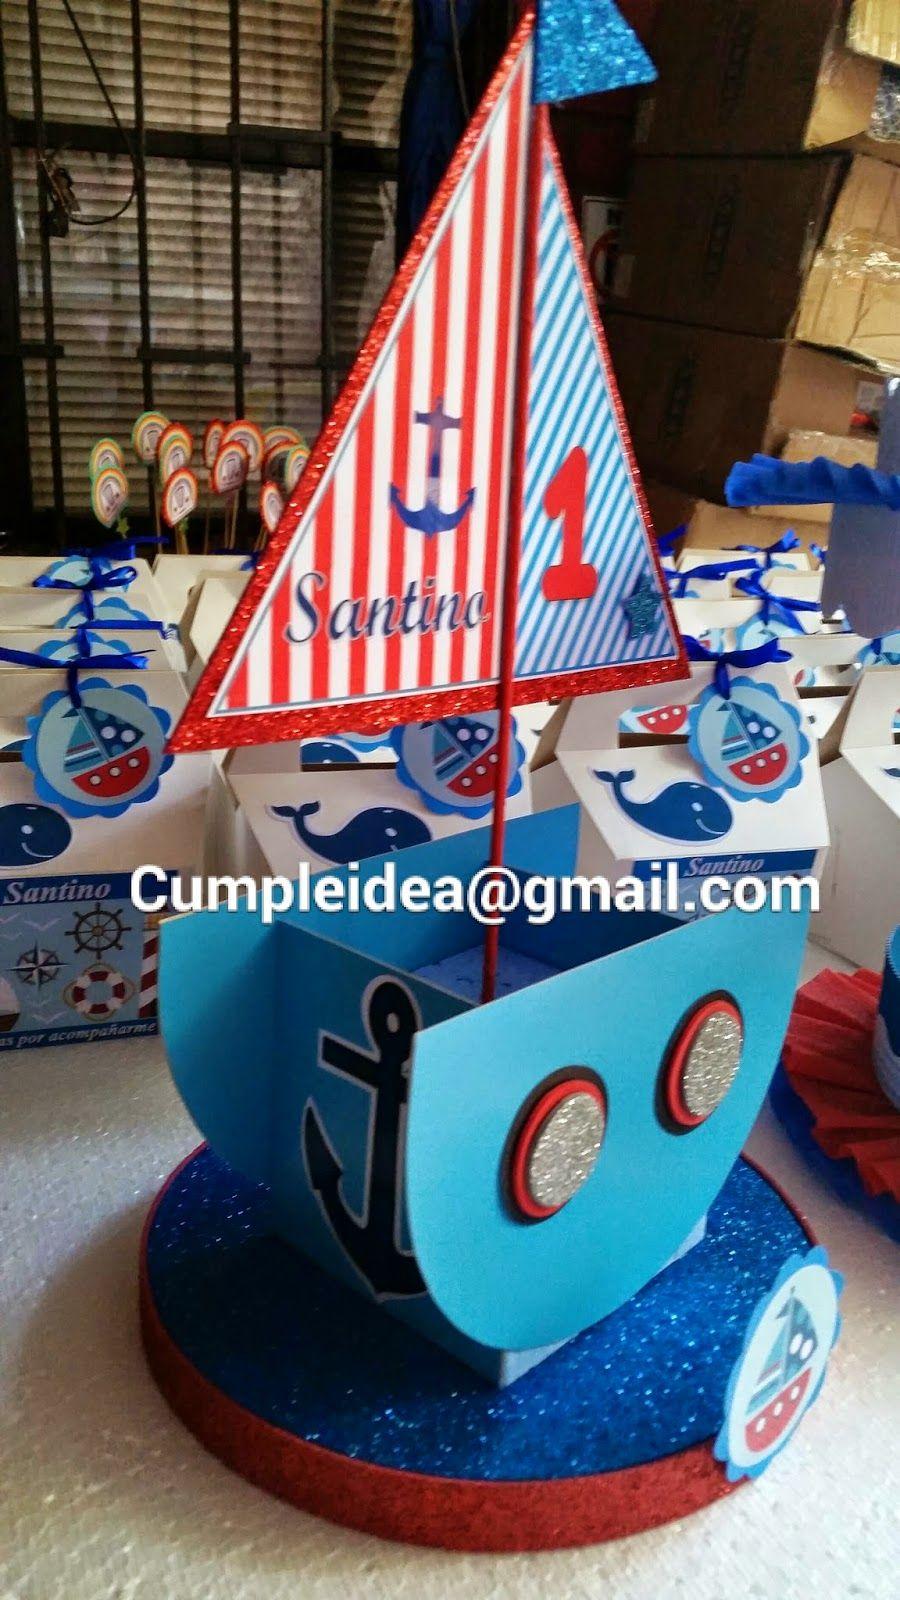 Dise o y confeccion de centros de mesa dulceros - Centros de mesa para cumpleanos ...